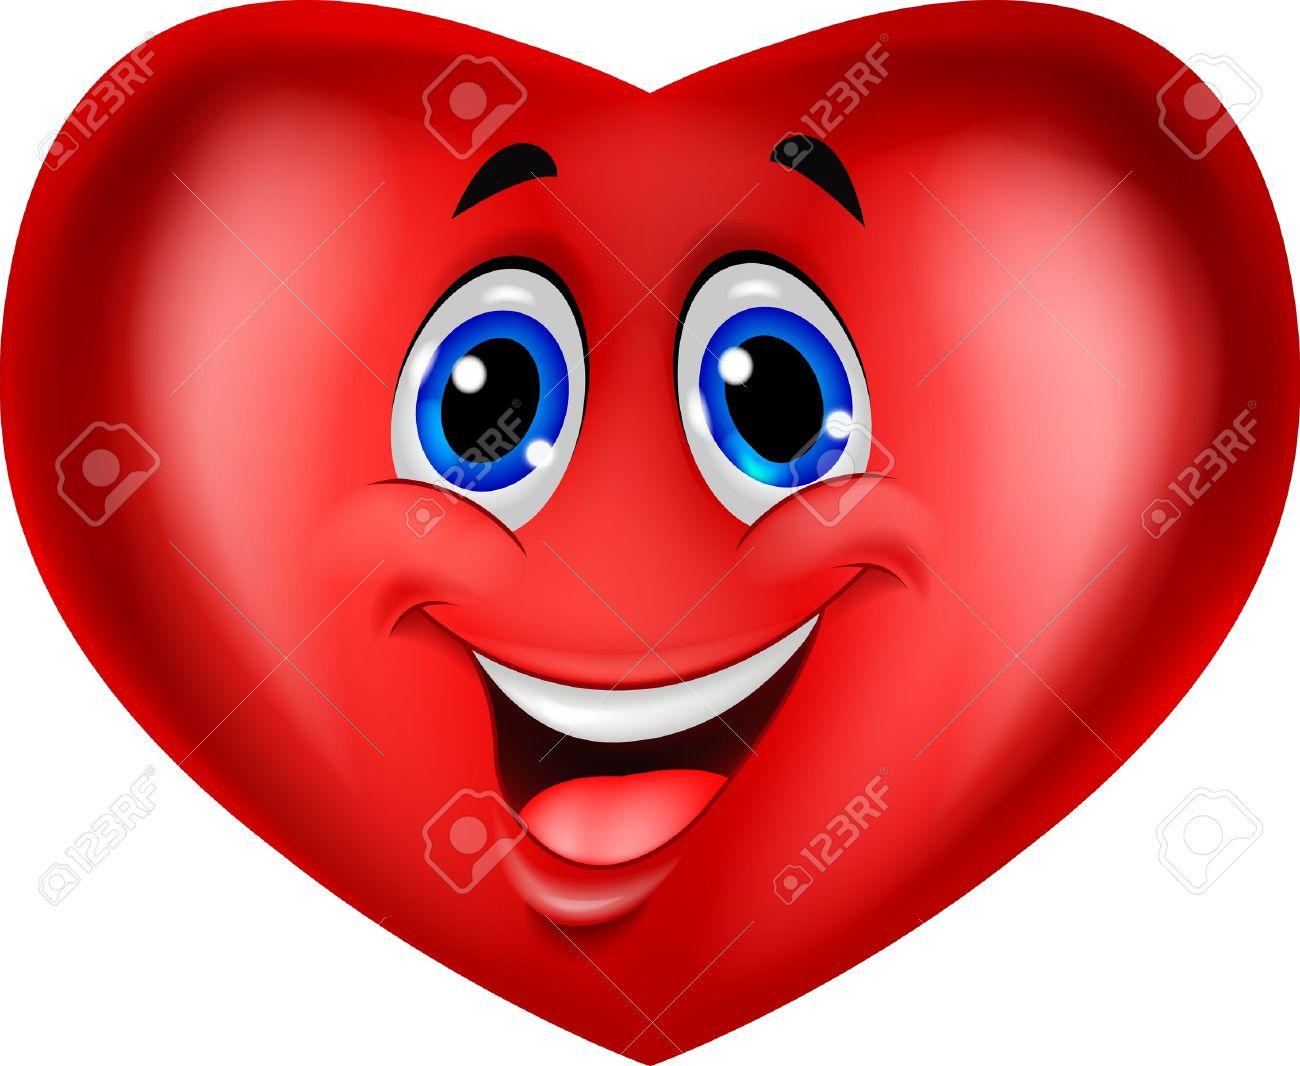 2,108 Cartoon Bright Red Heart Stock Vector Illustration And.